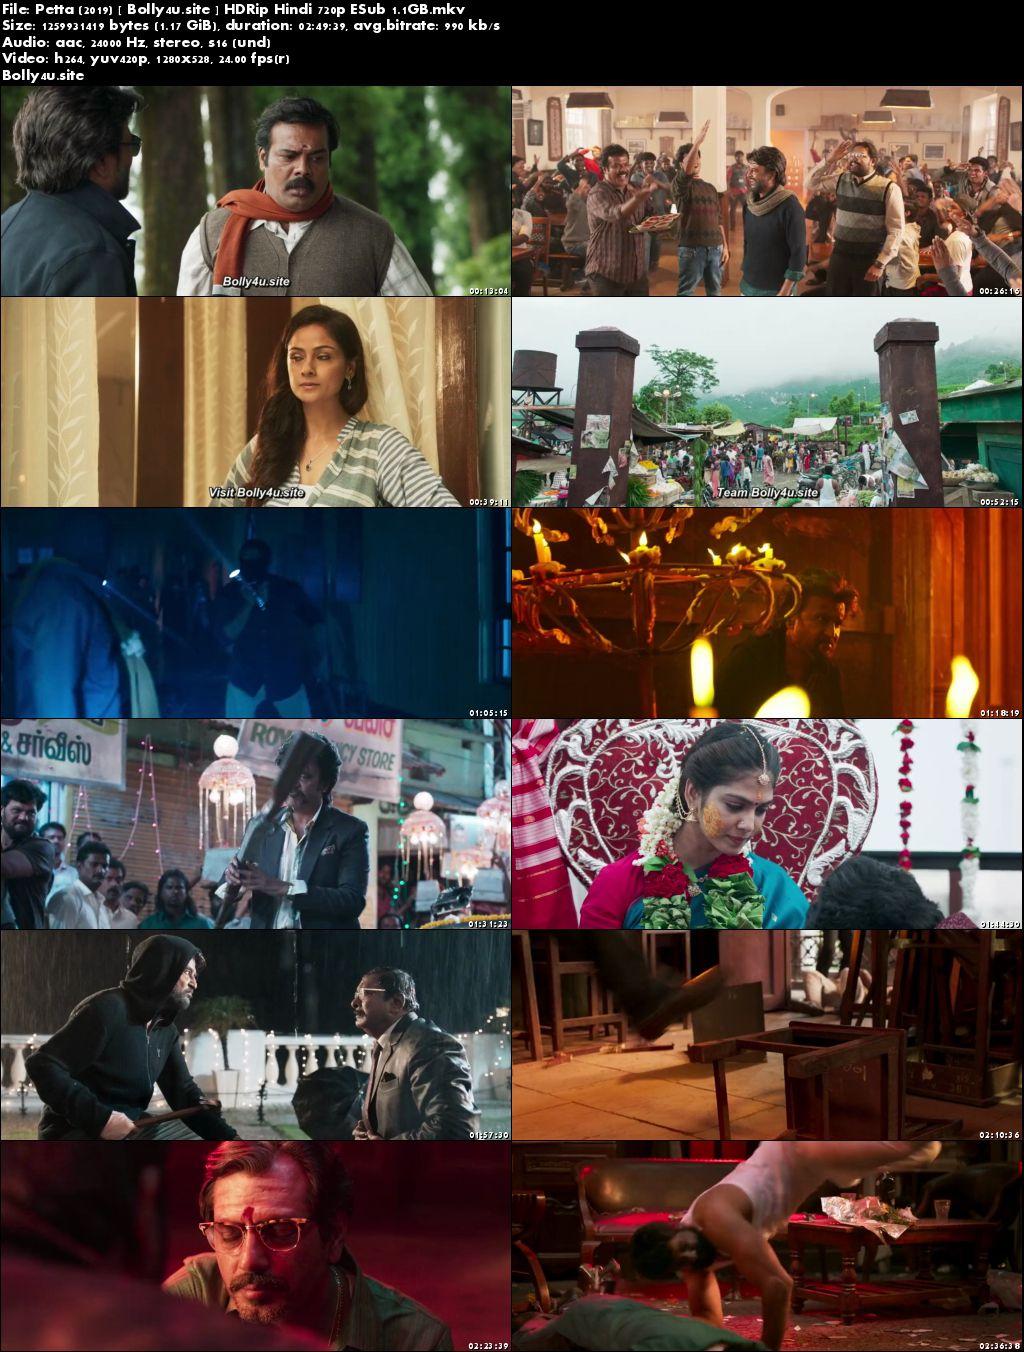 Full Movie Download In Hindi 480p Deadpool 2 Hindi Dubbed full movie